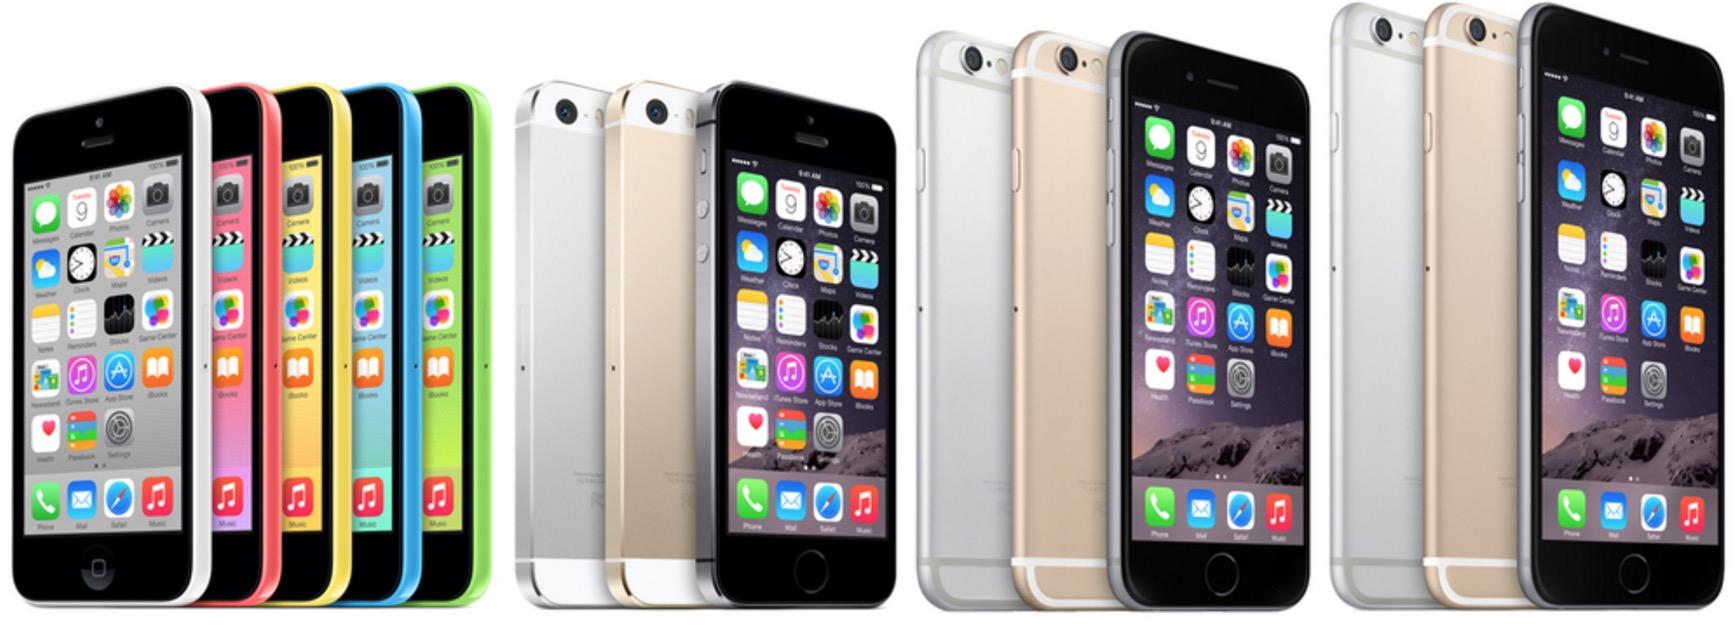 iphone family'